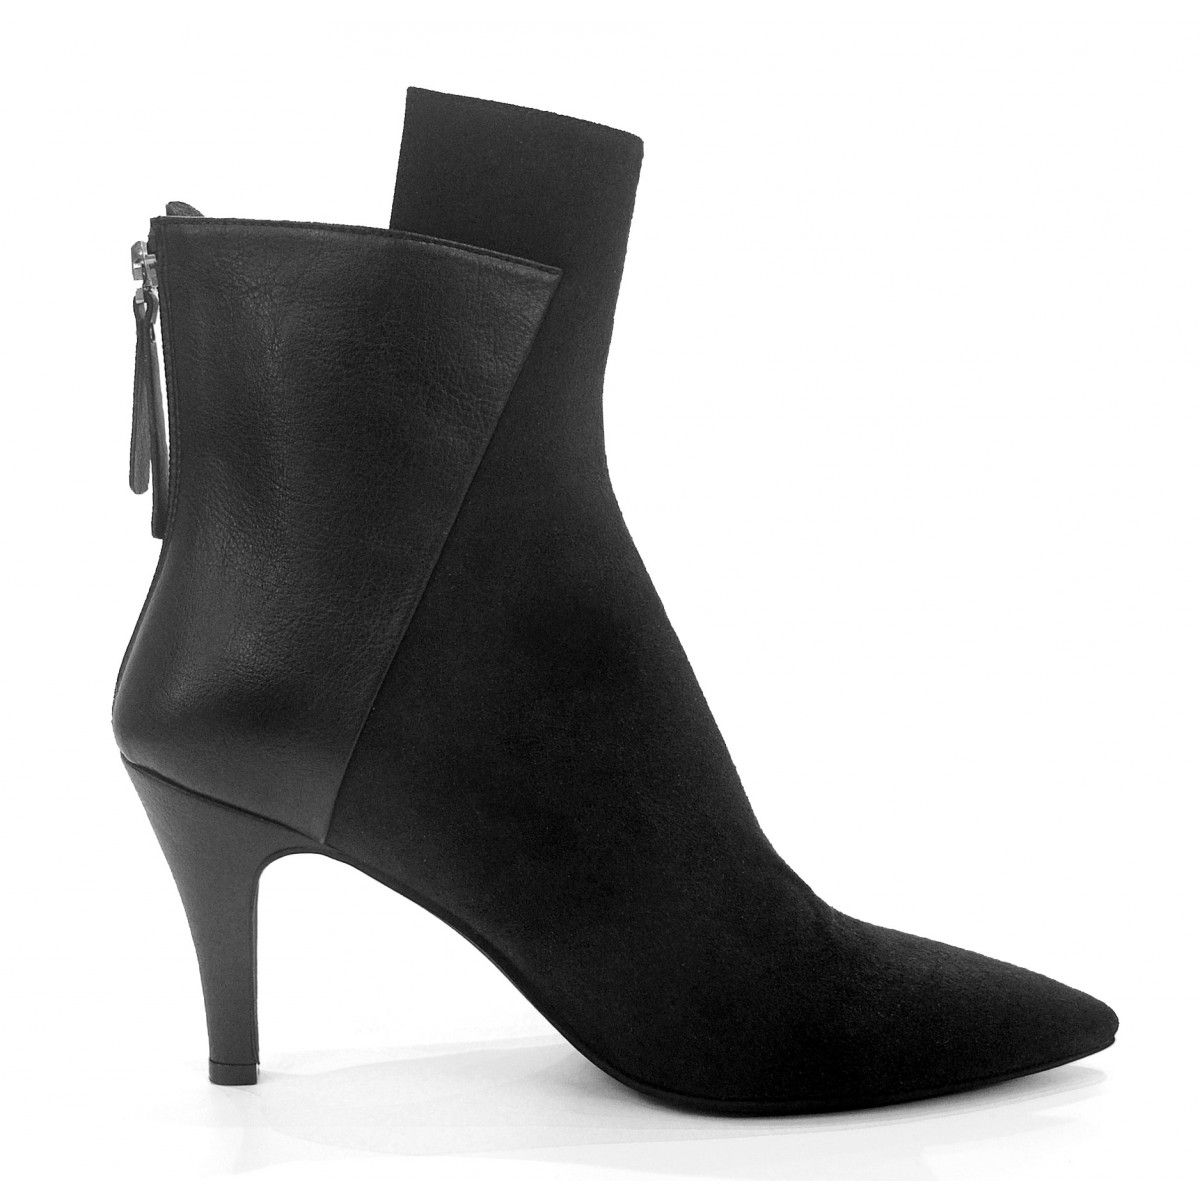 d2291fae30 Noah: Italian luxury vegan shoes, bags and accessories | Fashion ...